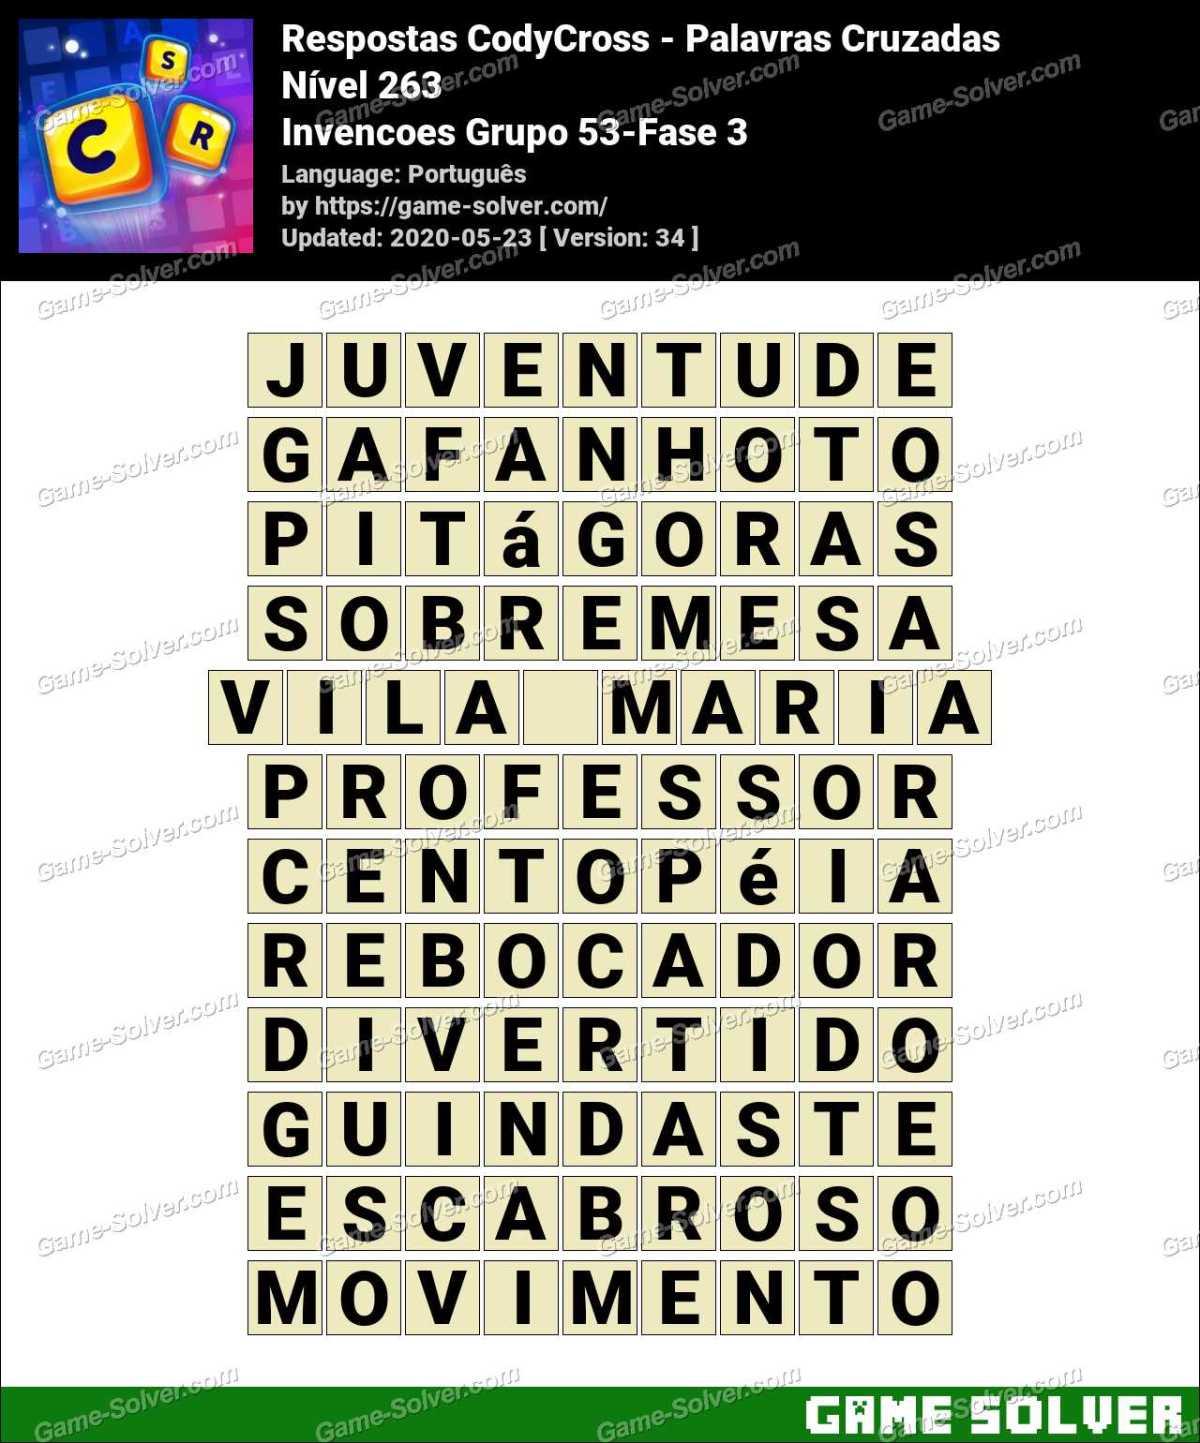 Respostas CodyCross Invencoes Grupo 53-Fase 3